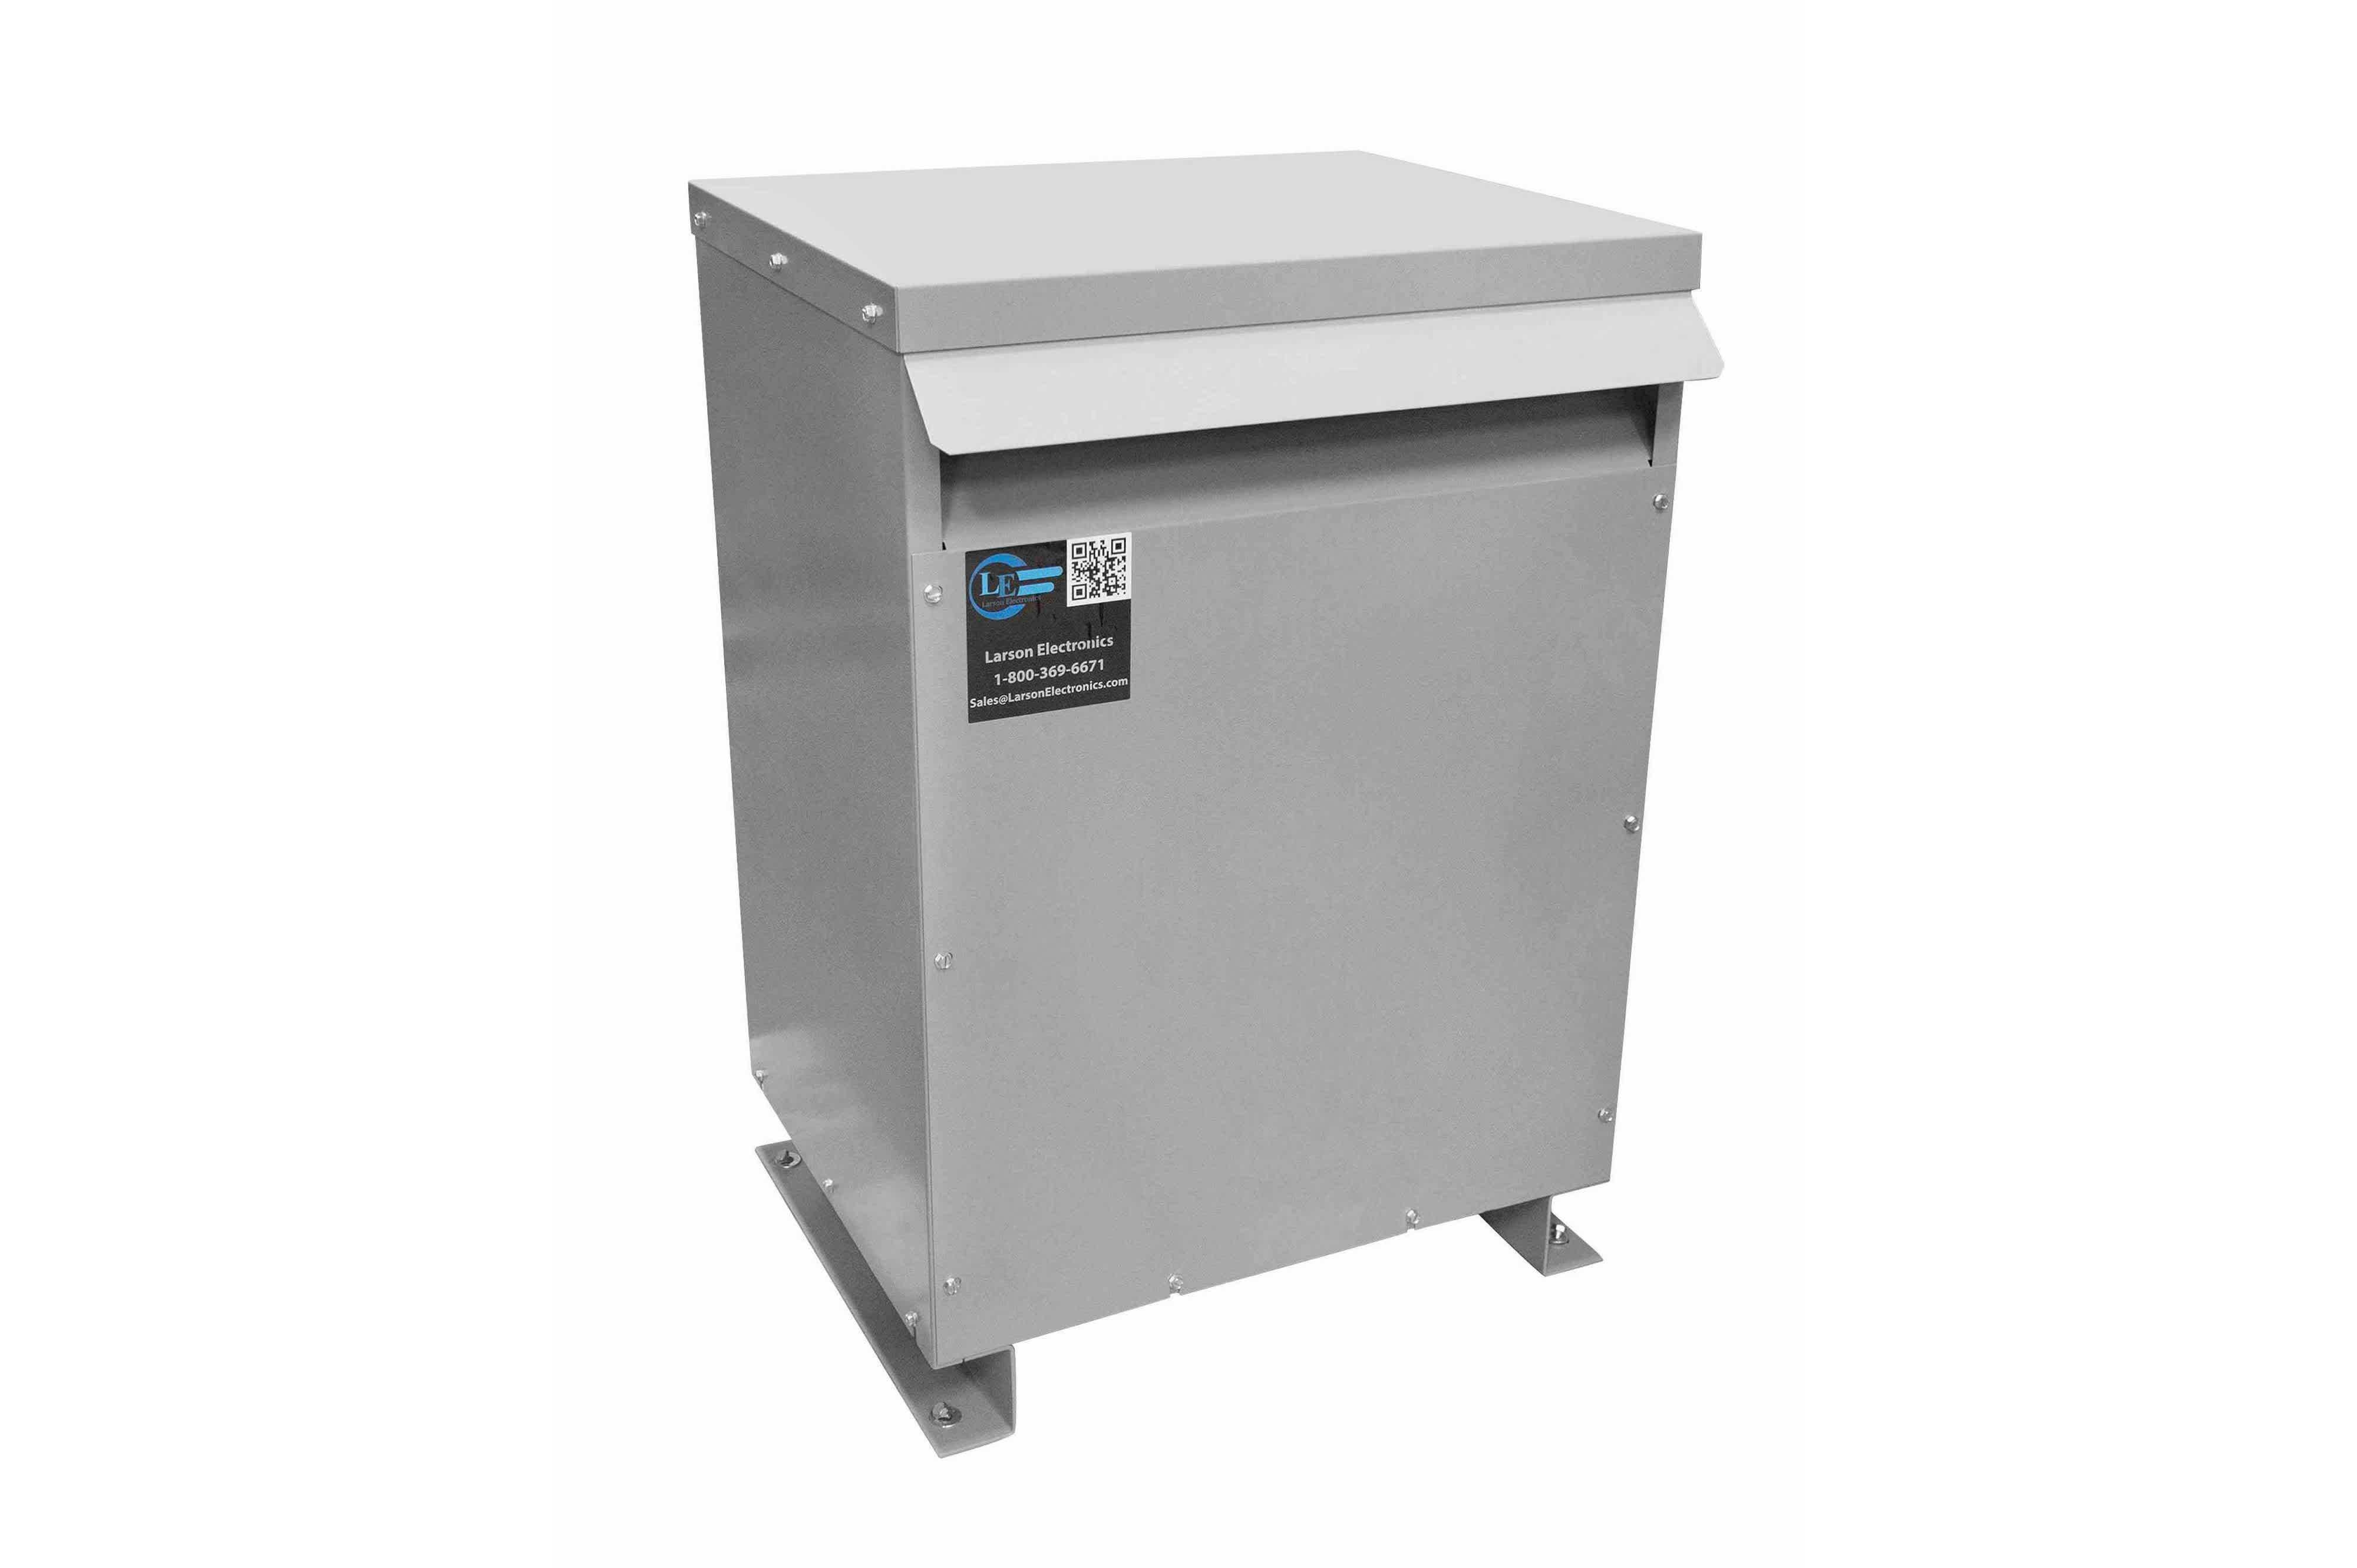 100 kVA 3PH Isolation Transformer, 415V Wye Primary, 480Y/277 Wye-N Secondary, N3R, Ventilated, 60 Hz